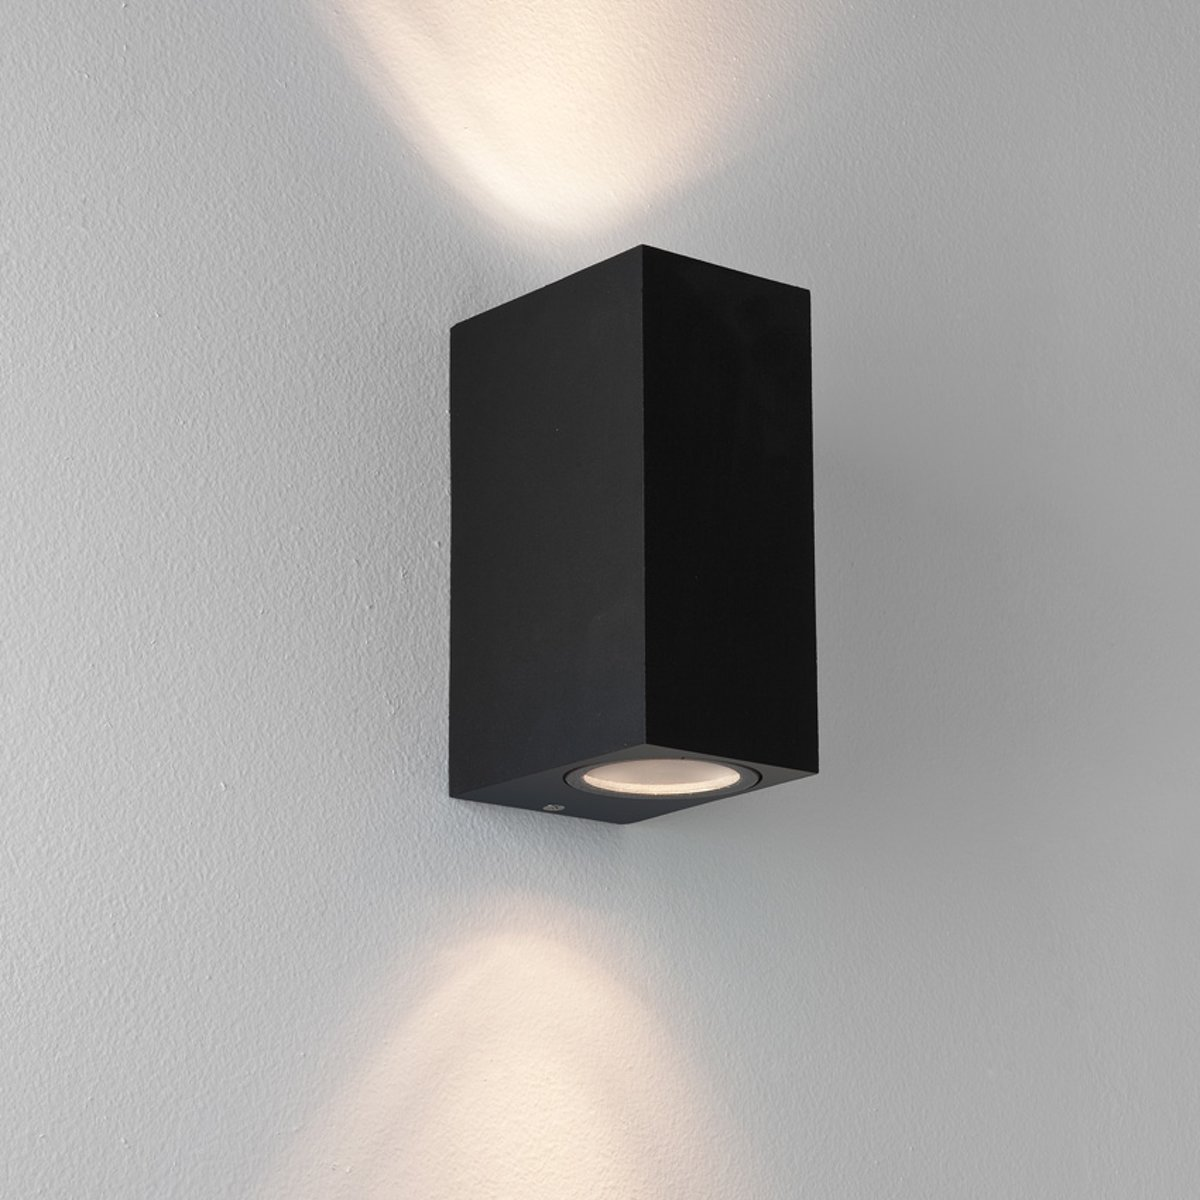 bol.com | Astro Lighting Tuinverlichting kopen? Kijk snel!